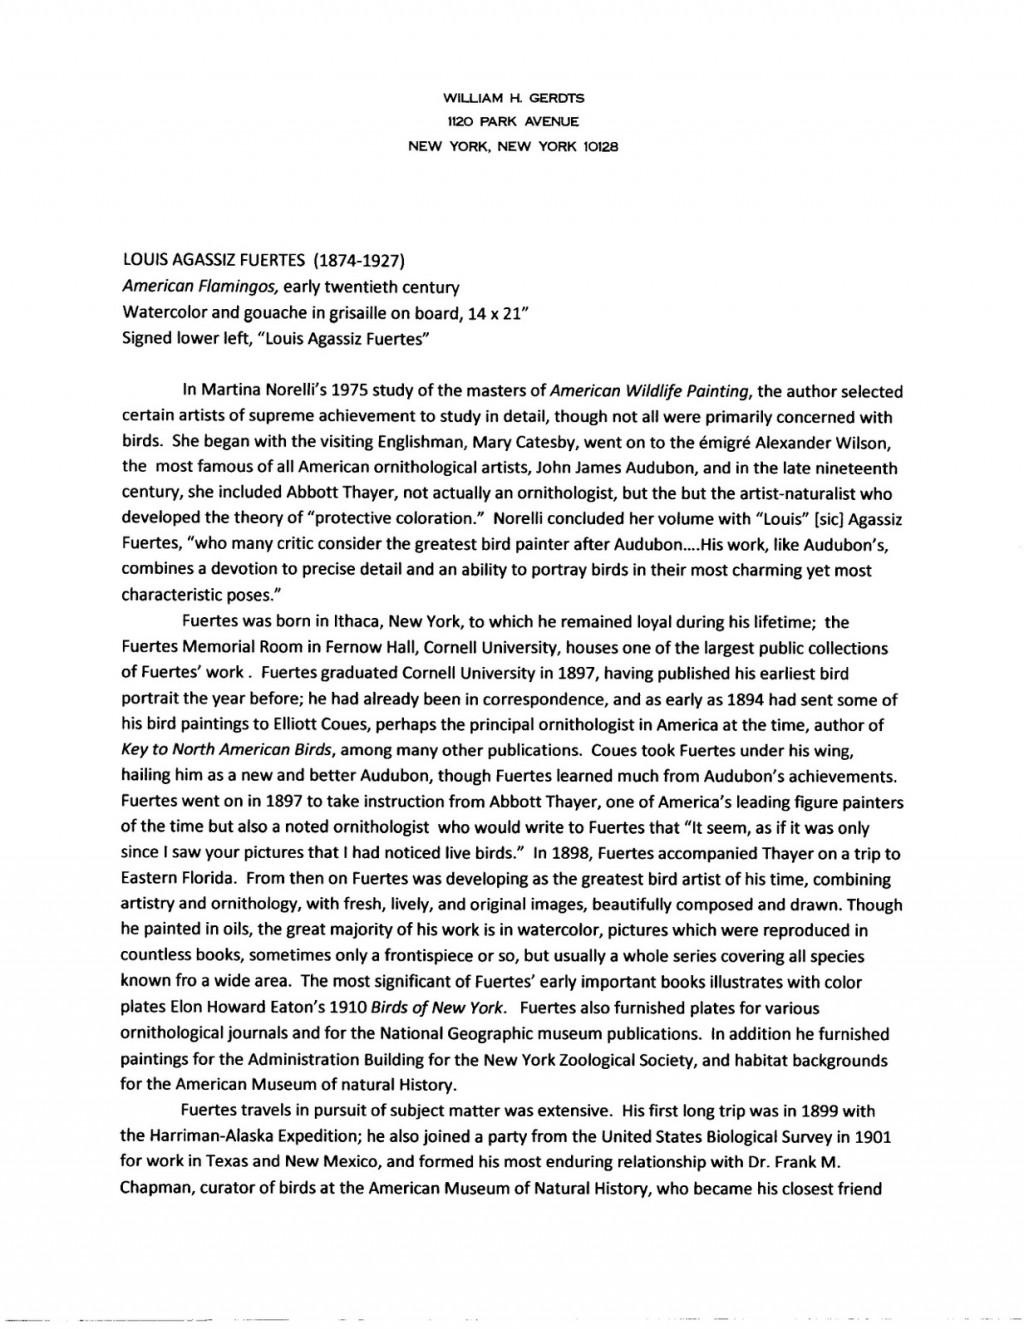 016 Comparative Essay Outline Fuertesamericanflamingos001 Singular Politics Research Paper Large